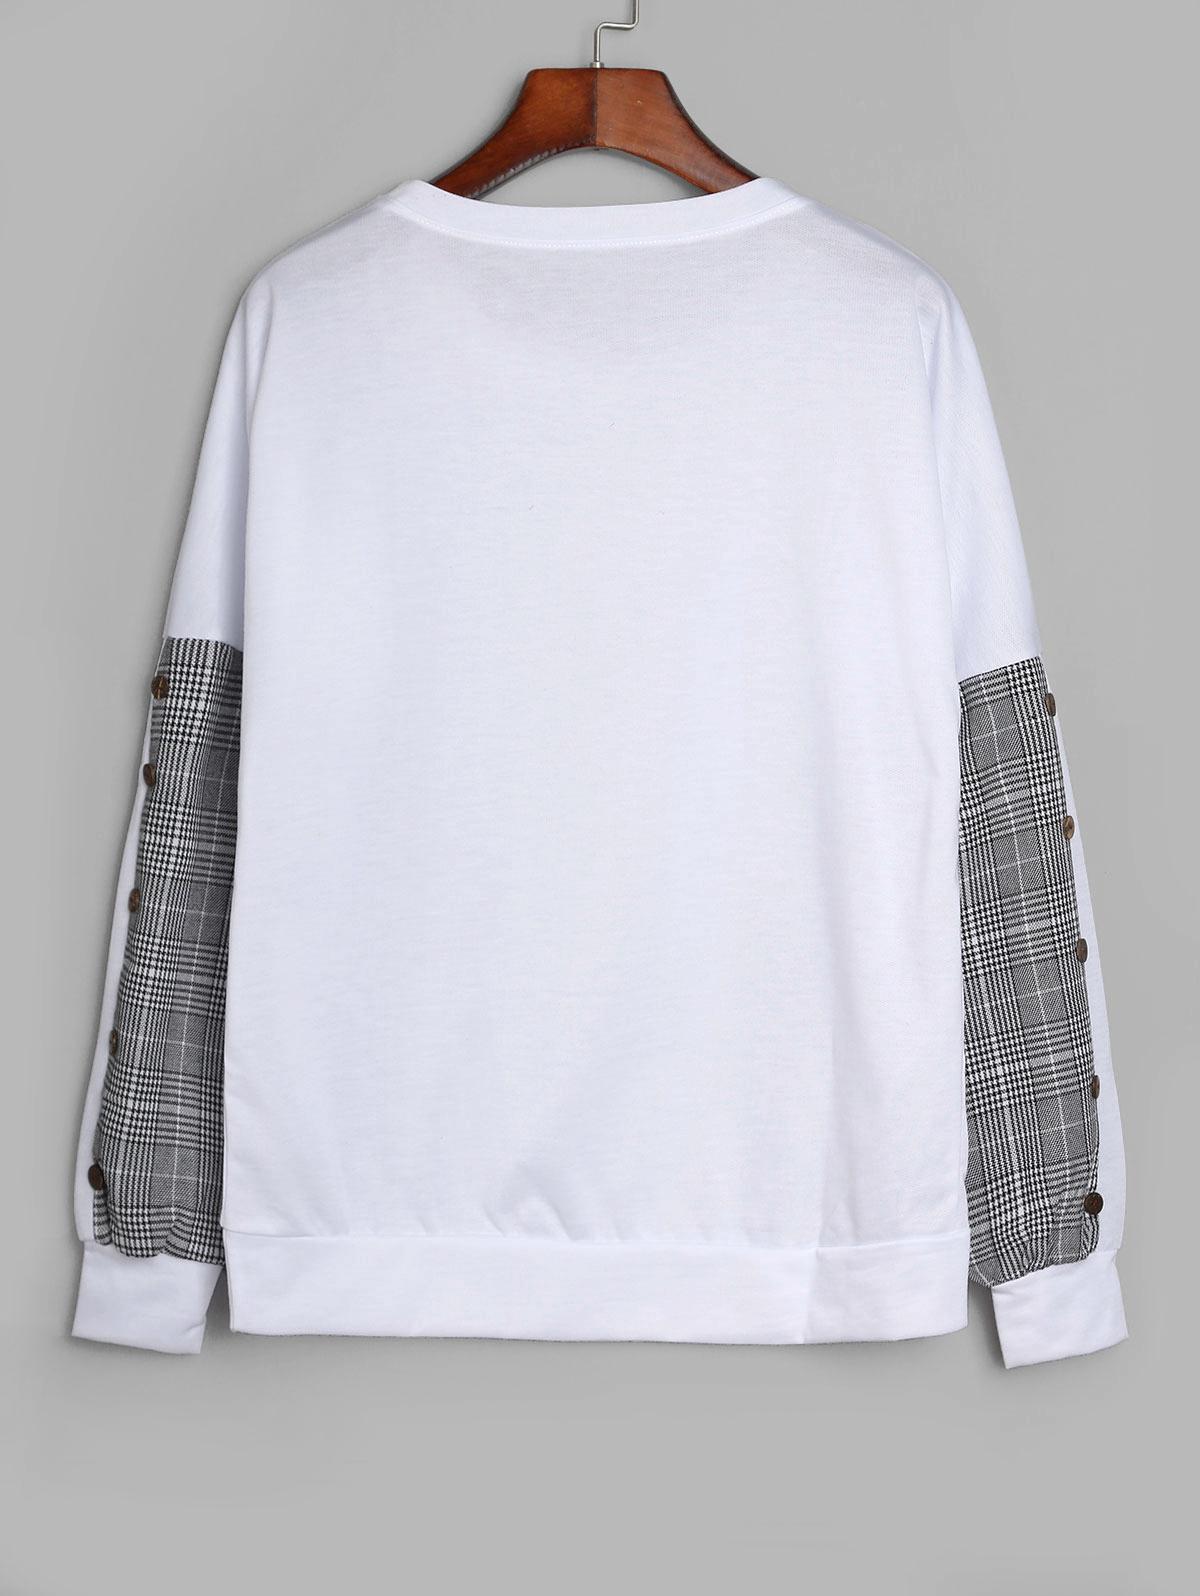 Drop Shoulder Mock Button Plaid Panel Sweatshirt